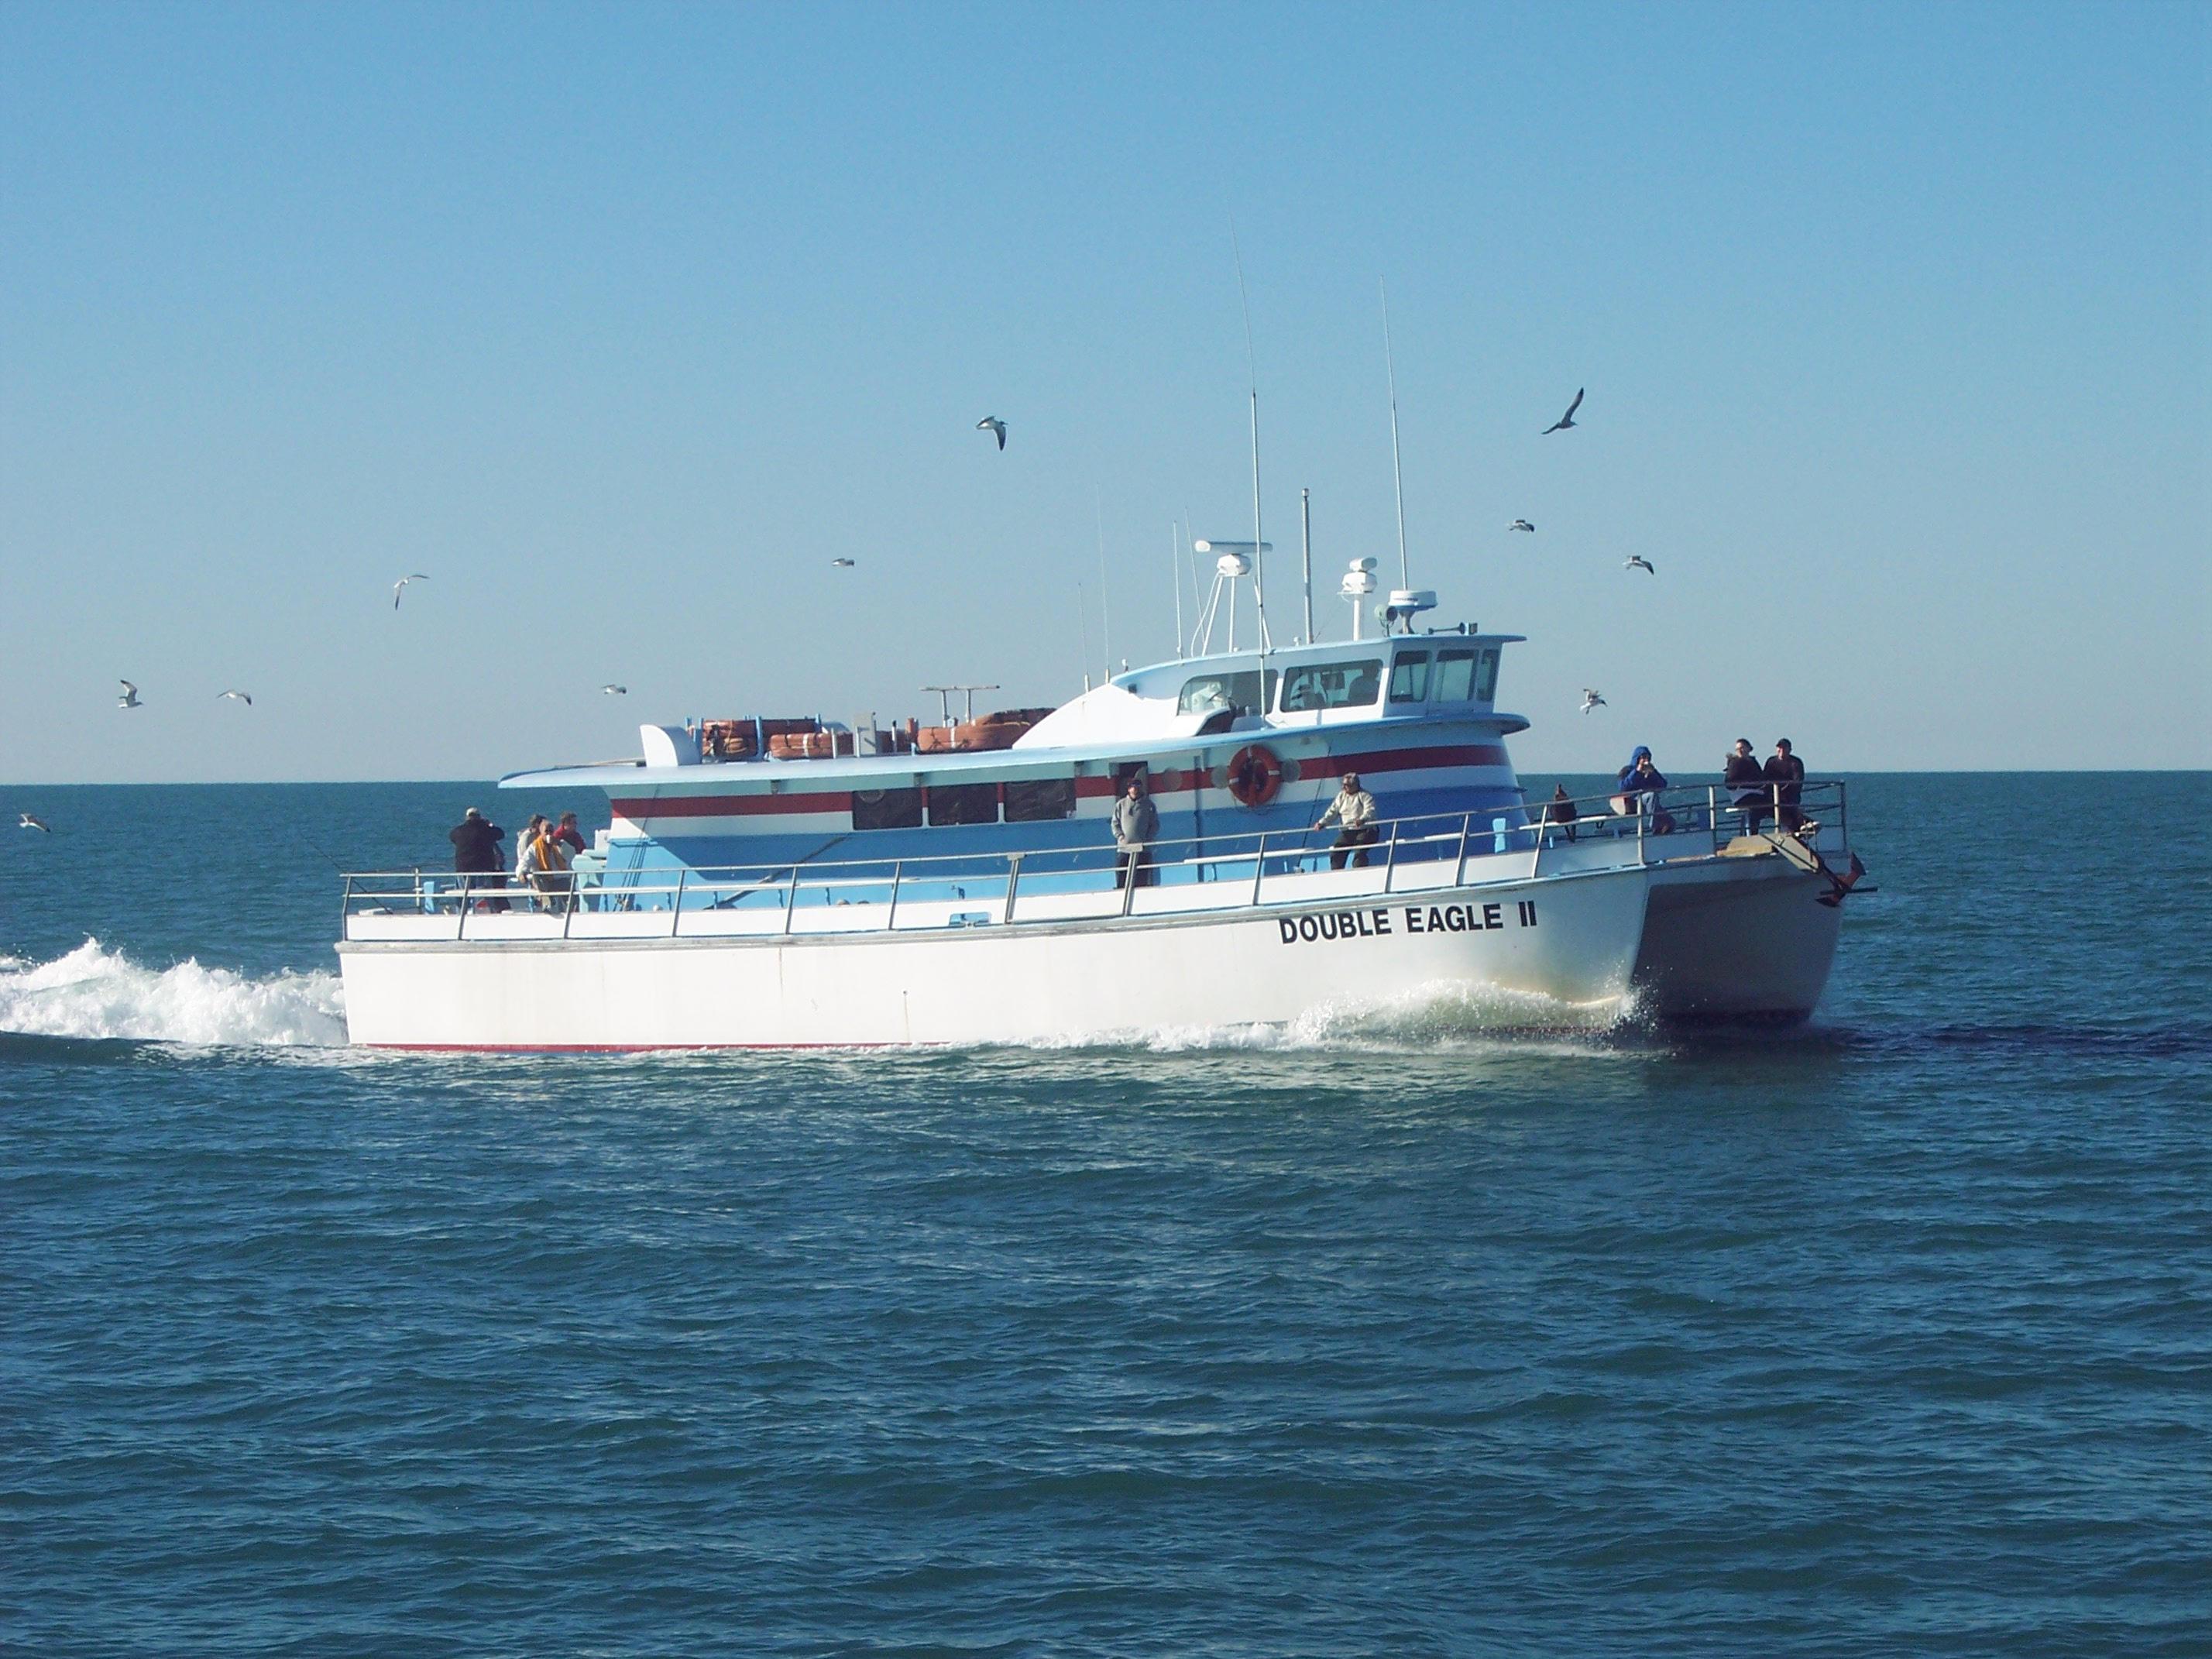 Boat at Deep Sea Fishing near Shephard's Beach Resort